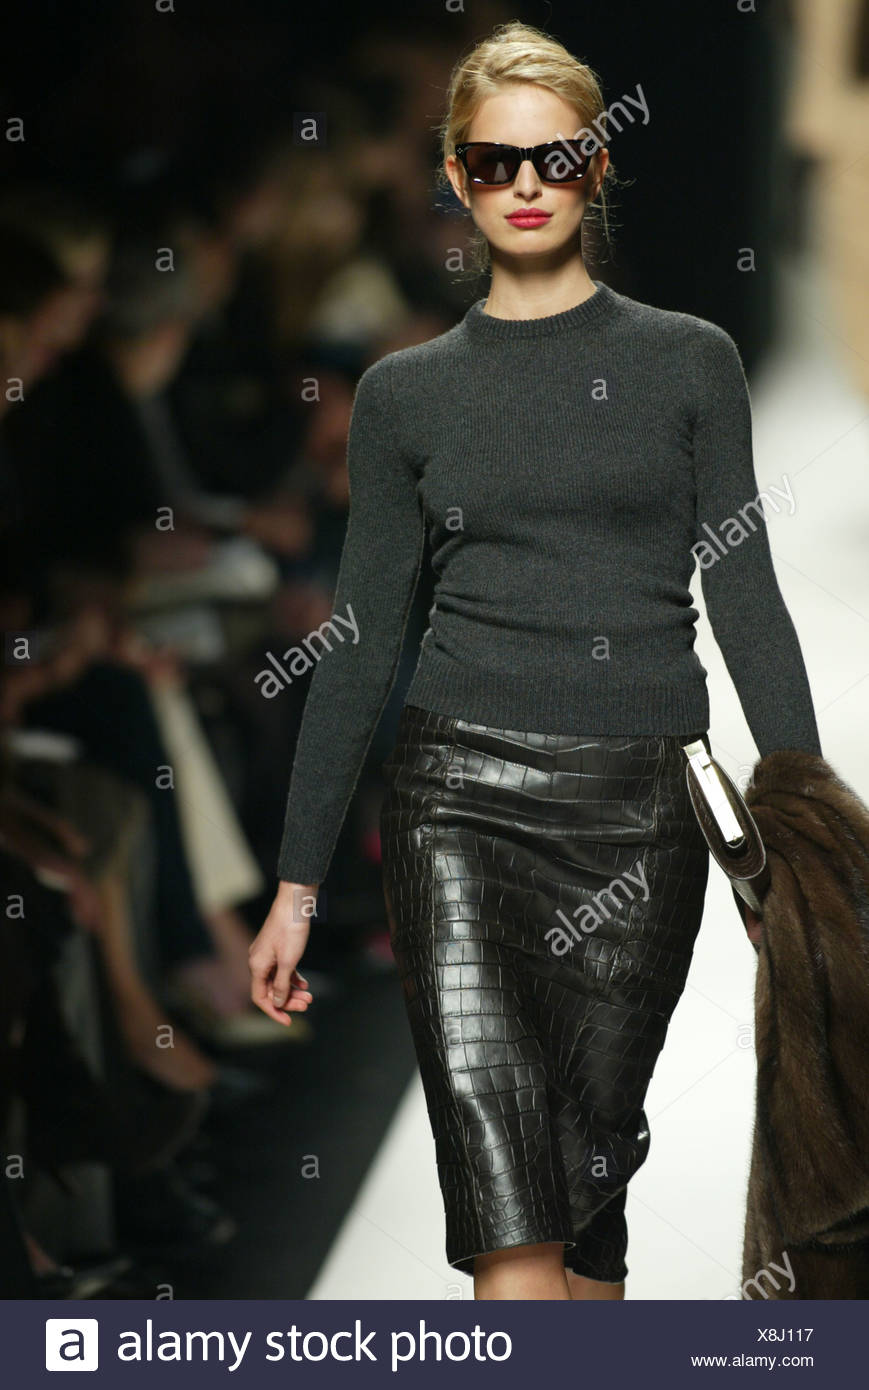 0f393e4b45 Celine Paris listo para ponerse Otoño Invierno Modelo Karolina Kurkova  cabello rubio apagado cara gafas de